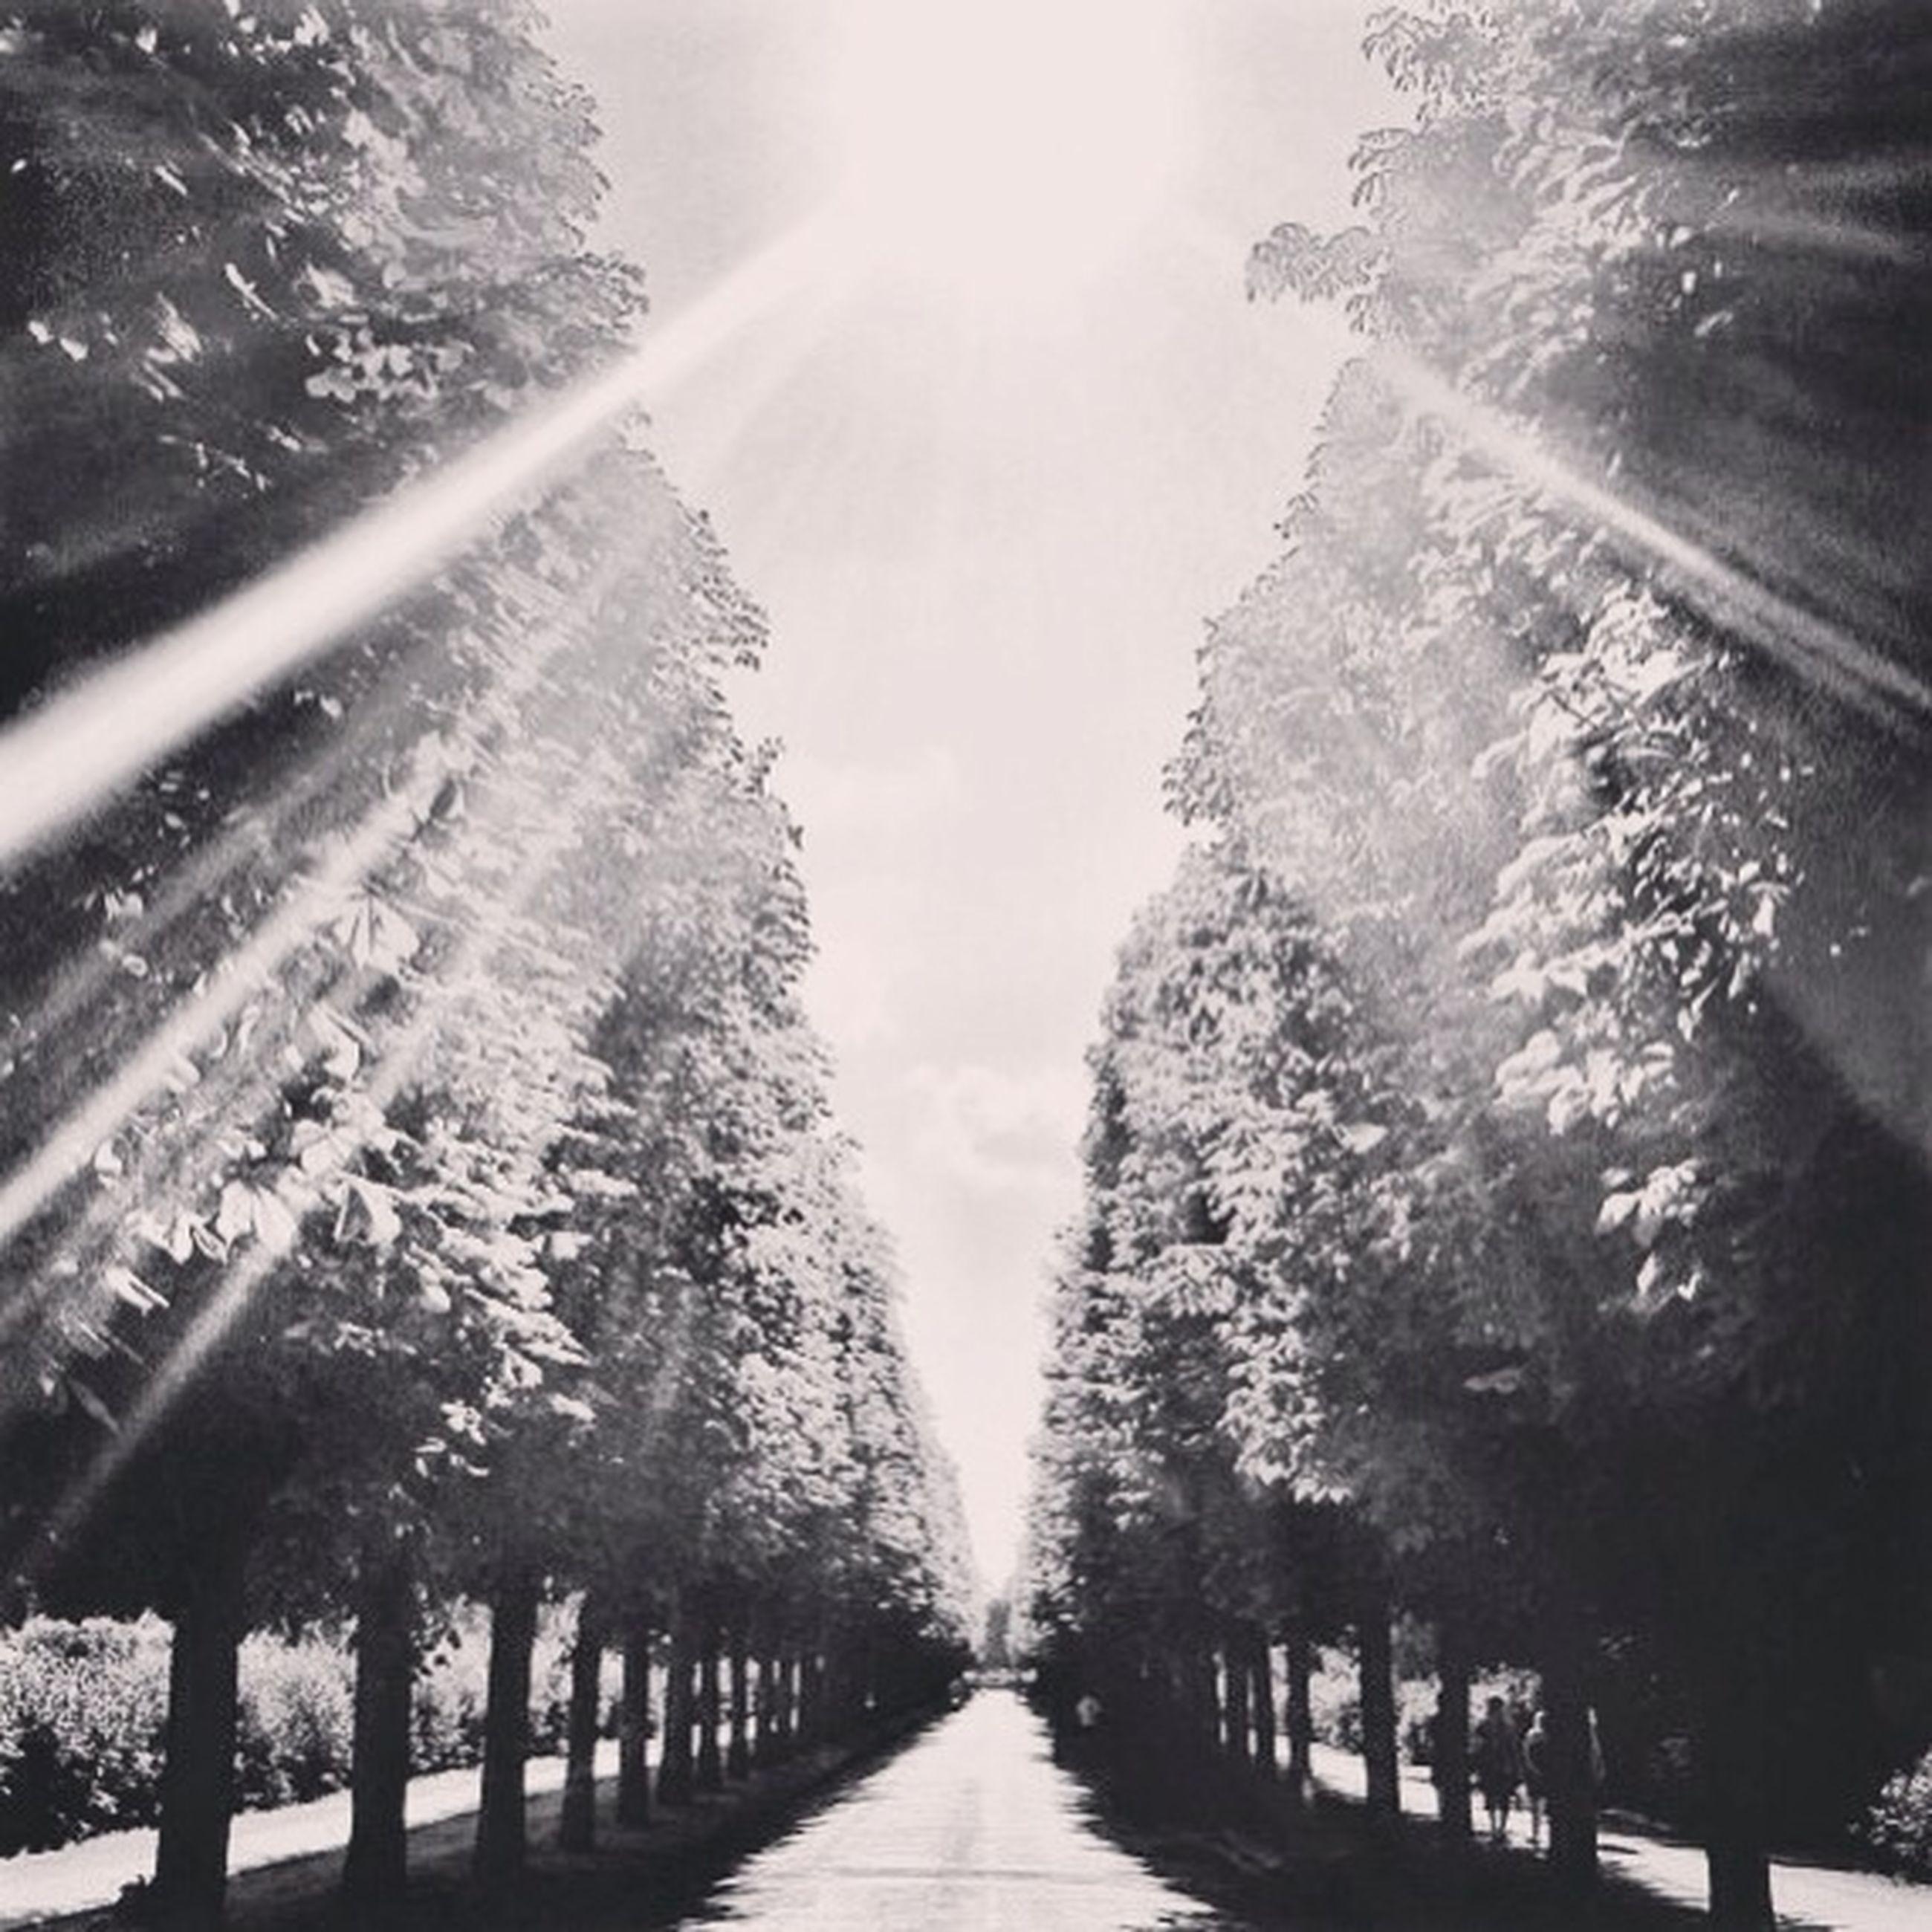 the way forward, diminishing perspective, vanishing point, tree, sunlight, road, transportation, sunbeam, sun, narrow, nature, sky, tranquility, sunny, footpath, lens flare, day, railing, beauty in nature, long